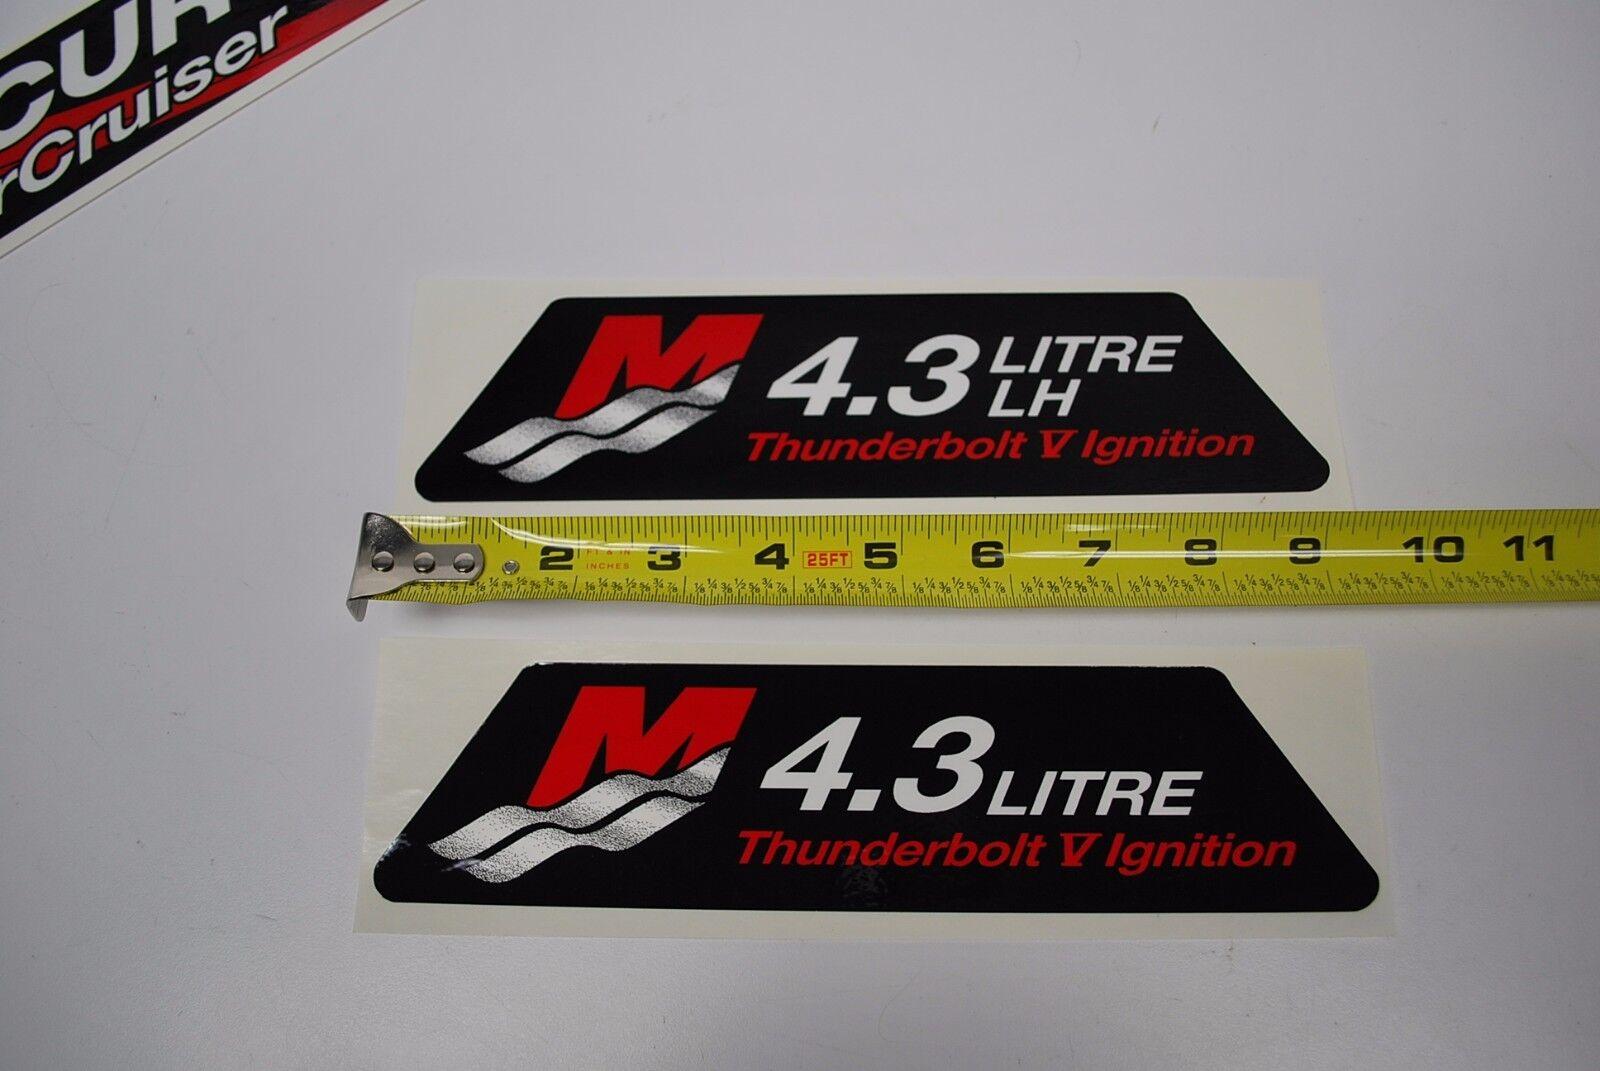 Mercury Mercruiser 4.3 Litre LH Thunderbolt Decal Sticker Set OEM 37-861314A7